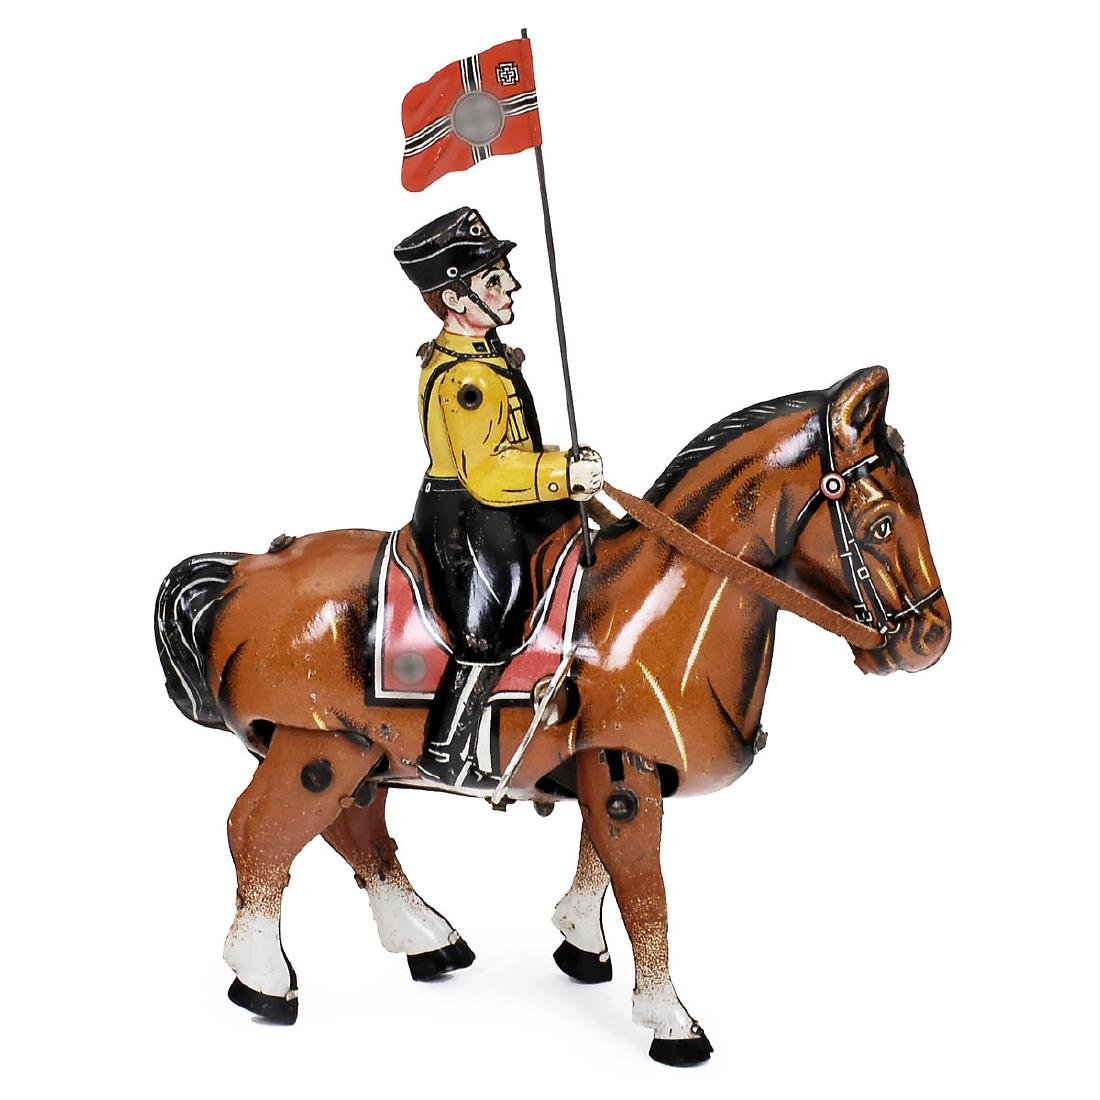 Horseback SA Man with Standard, c. 1935